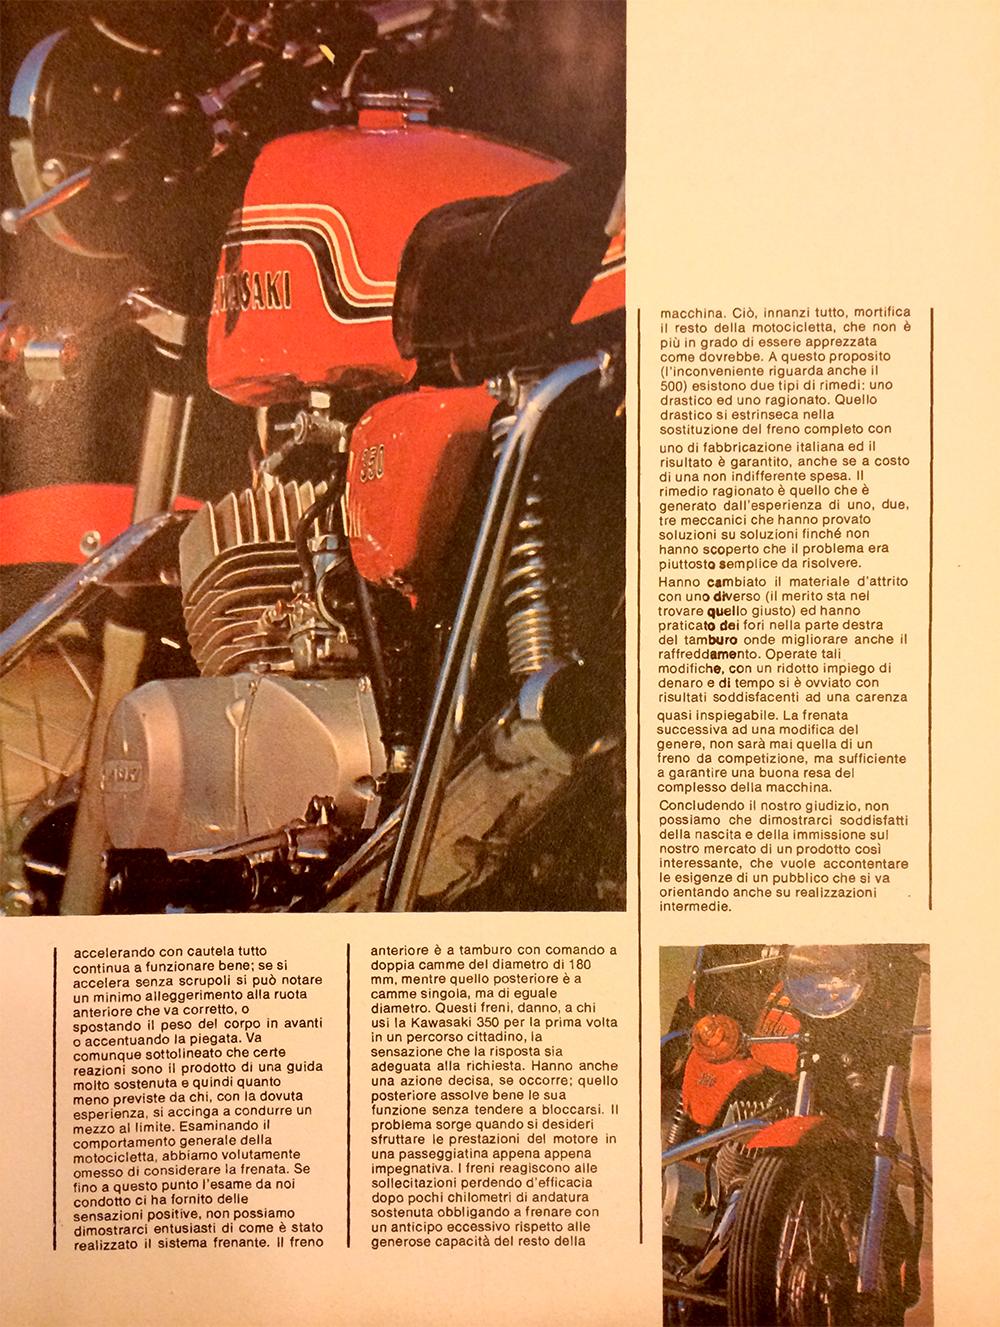 1971 Kawasaki 350 S2 Italy road test 11.jpg